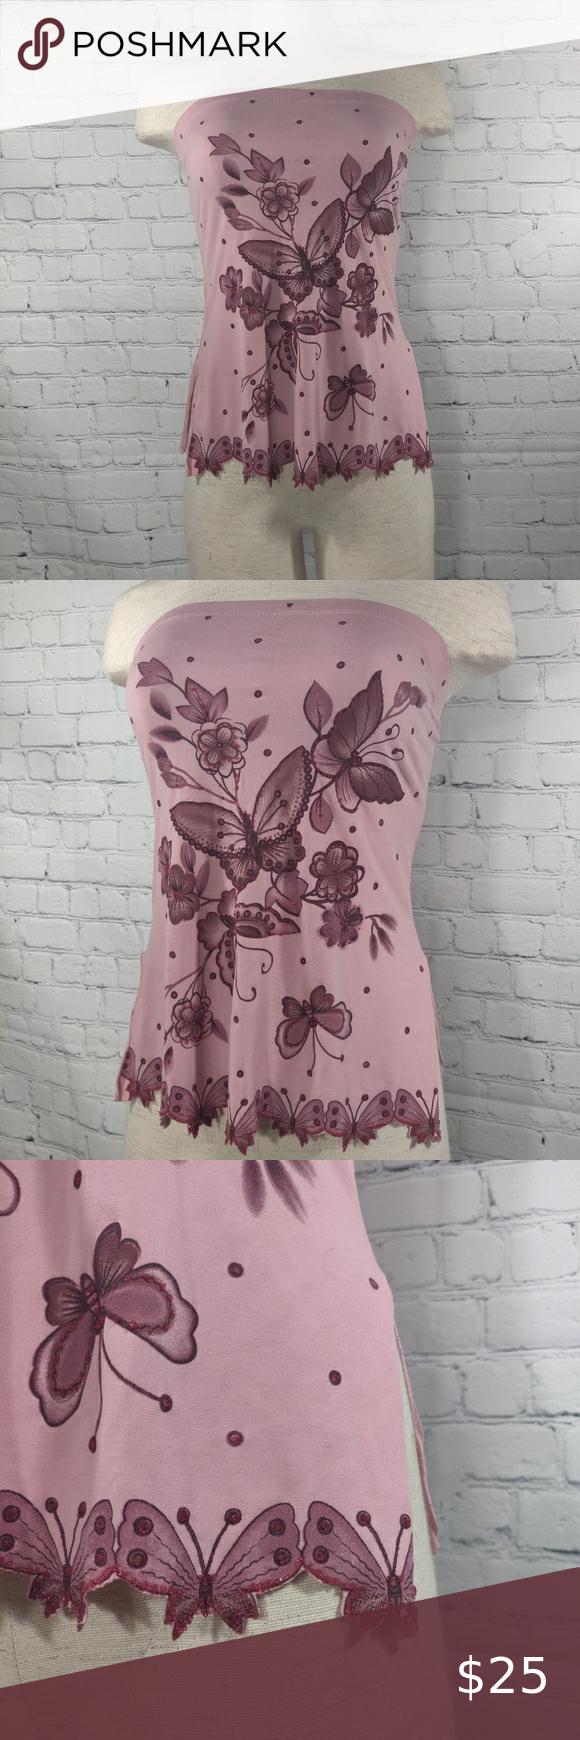 Vintage Lipstick Butterfly Strapless Top Size S